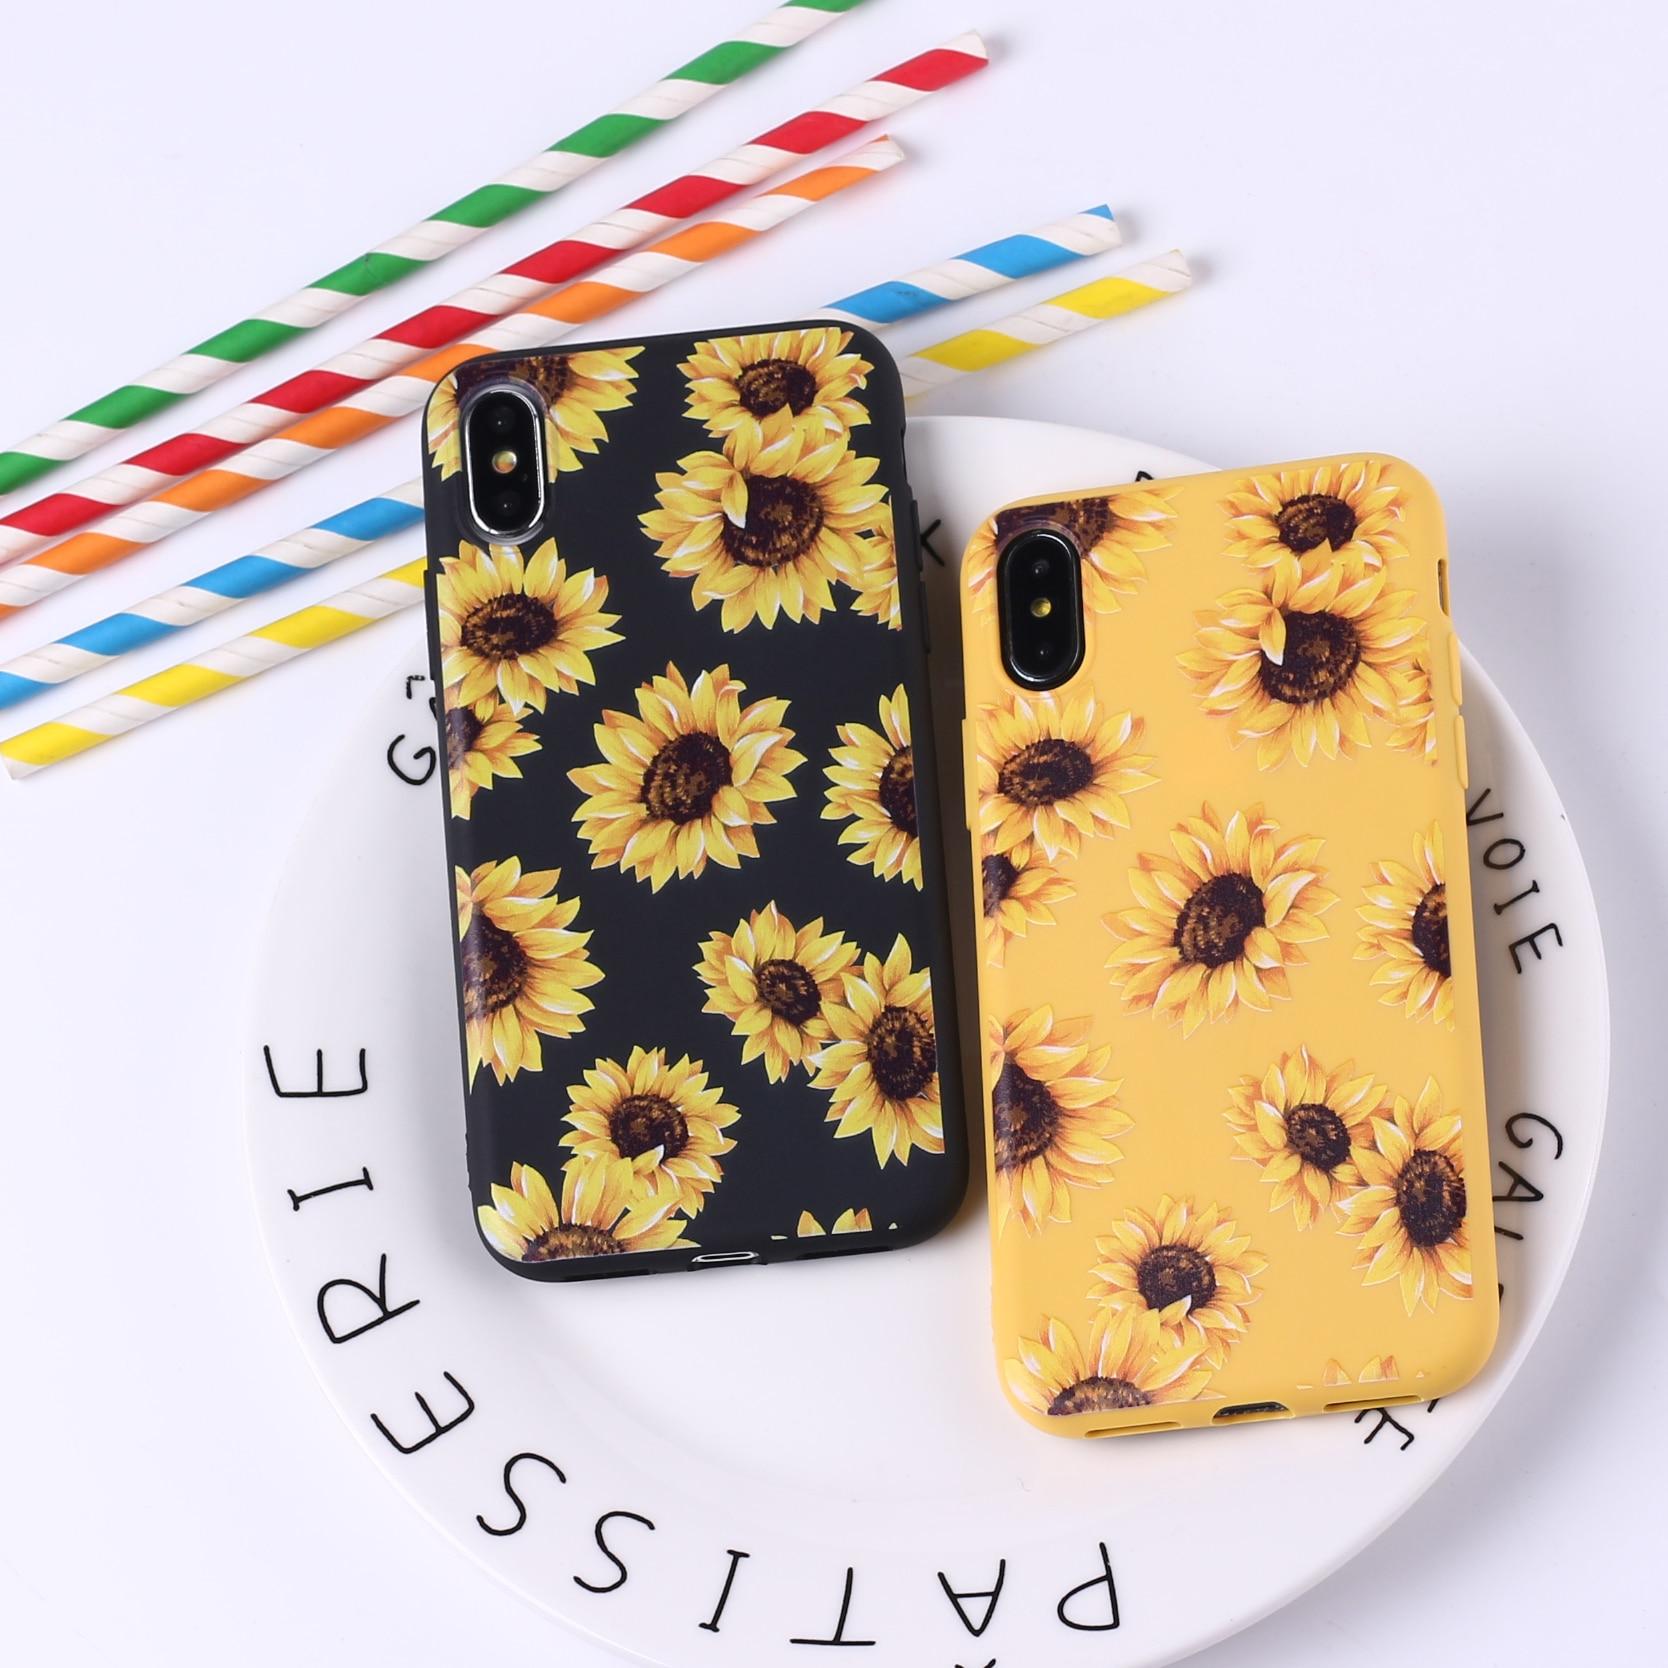 coque iphone 6 sunflower